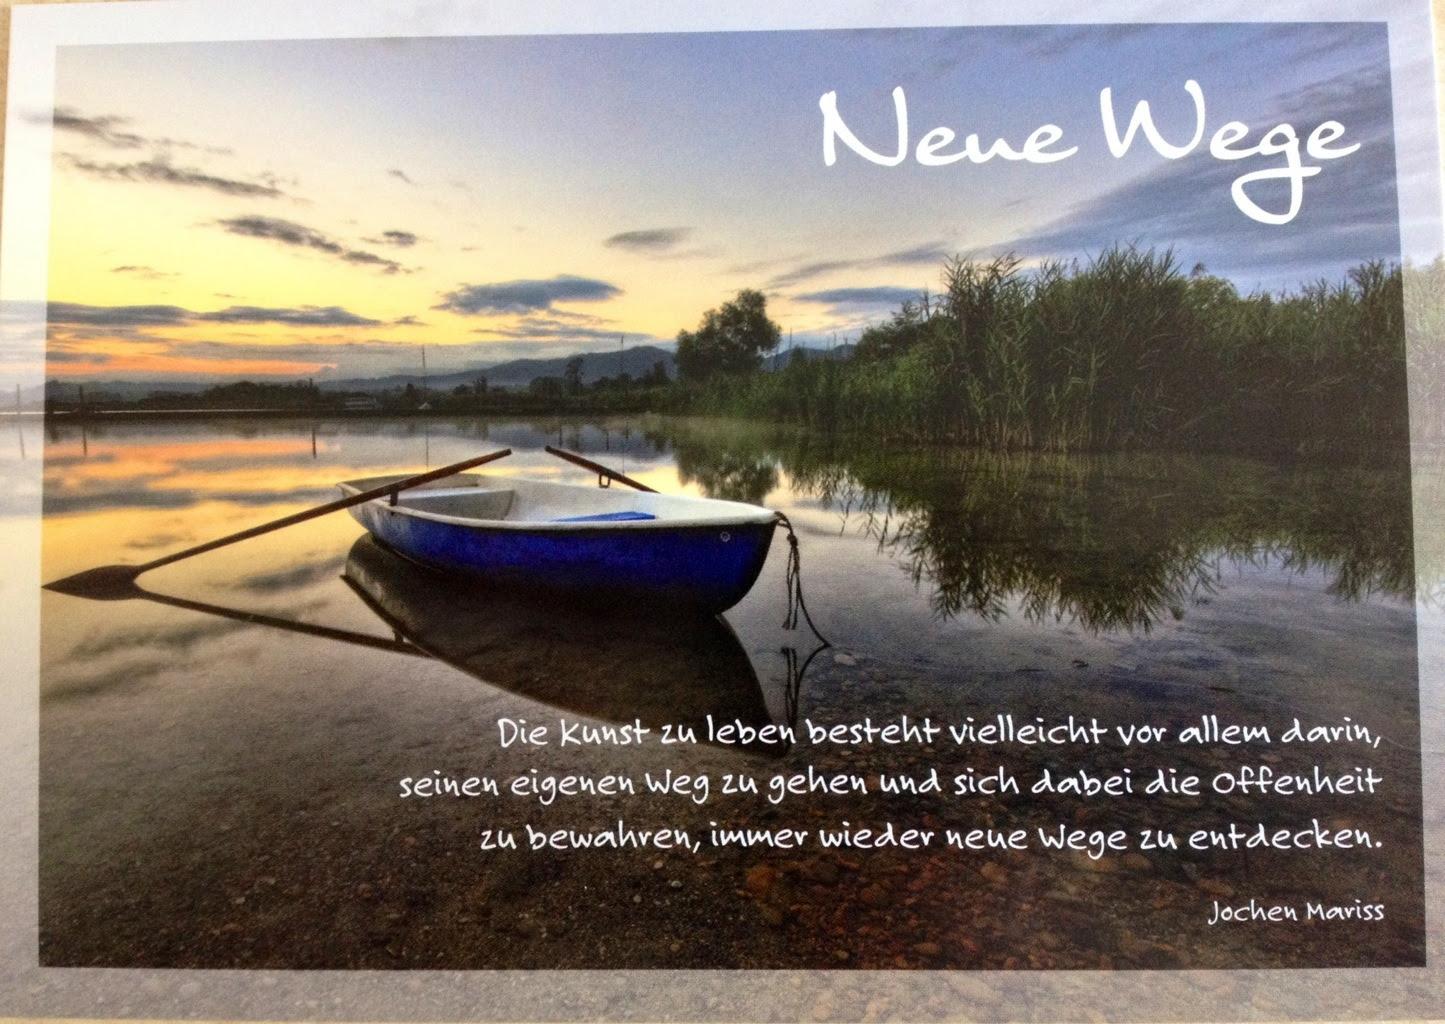 Zitate Abschied Reise Positive Zitate Leben